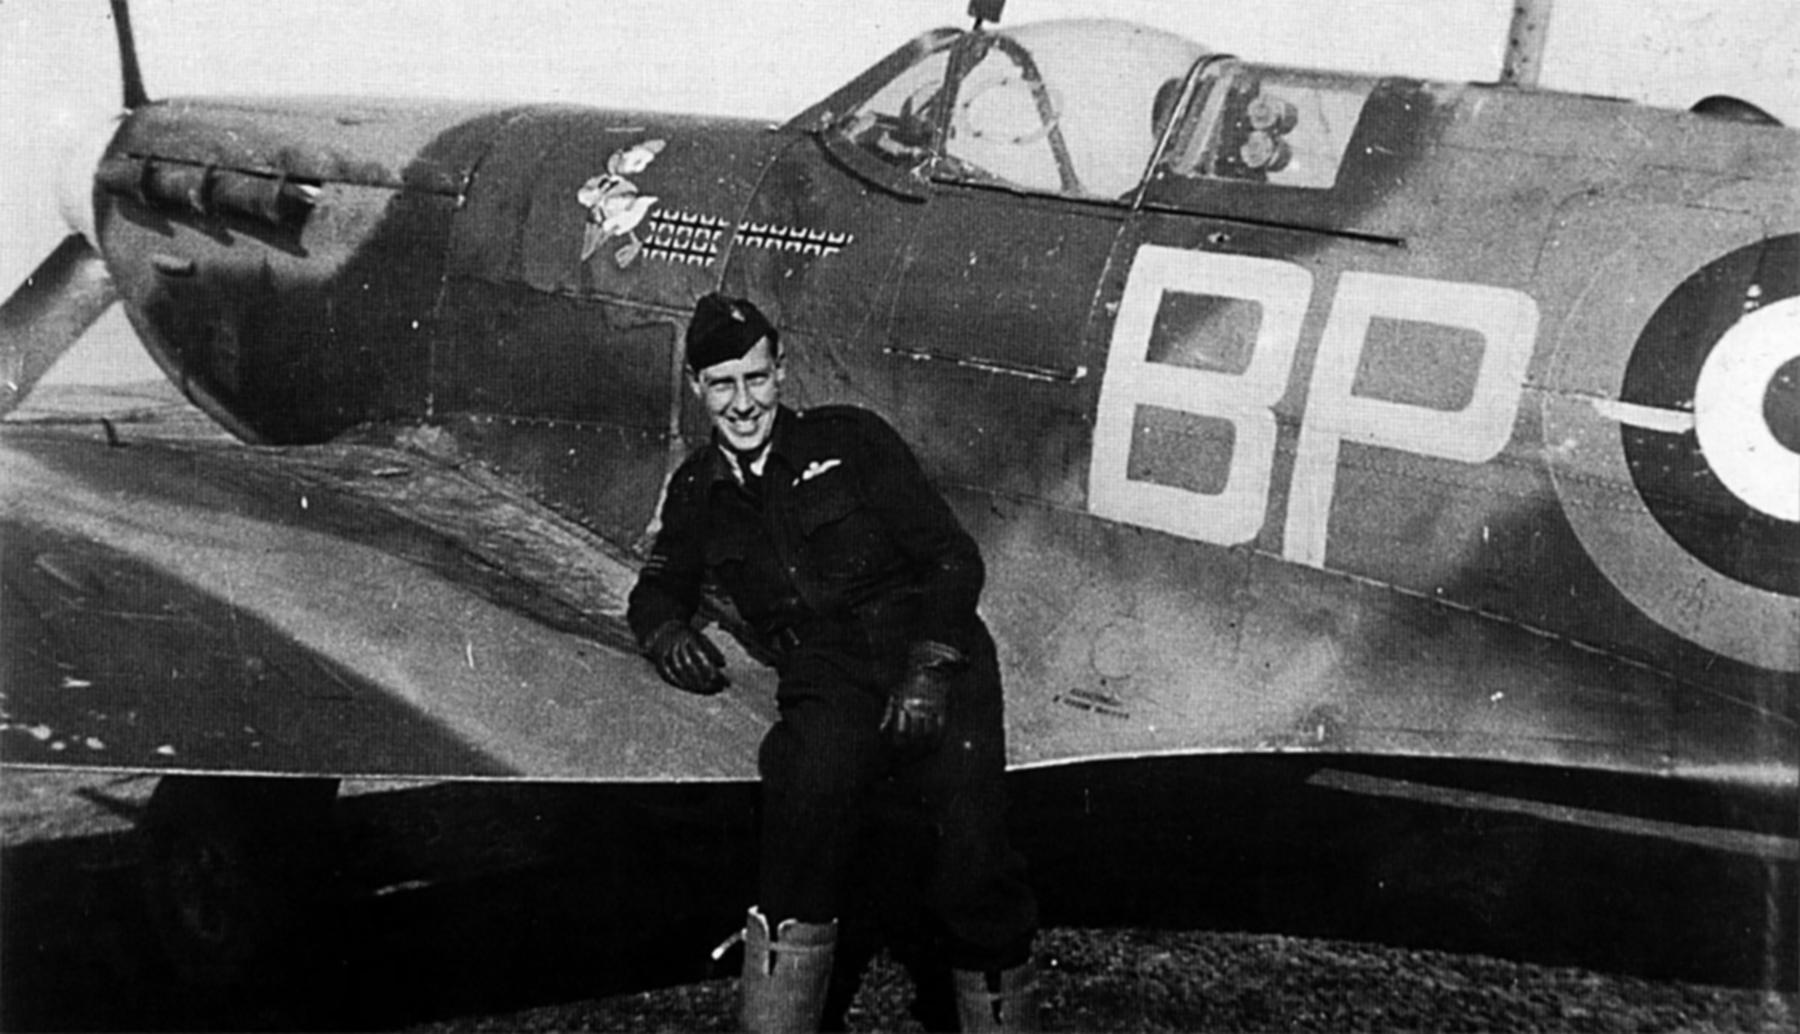 Spitfire MkVb RAAF 457Sqn BPH John AA Gibson BL351 England Dec 1941 01